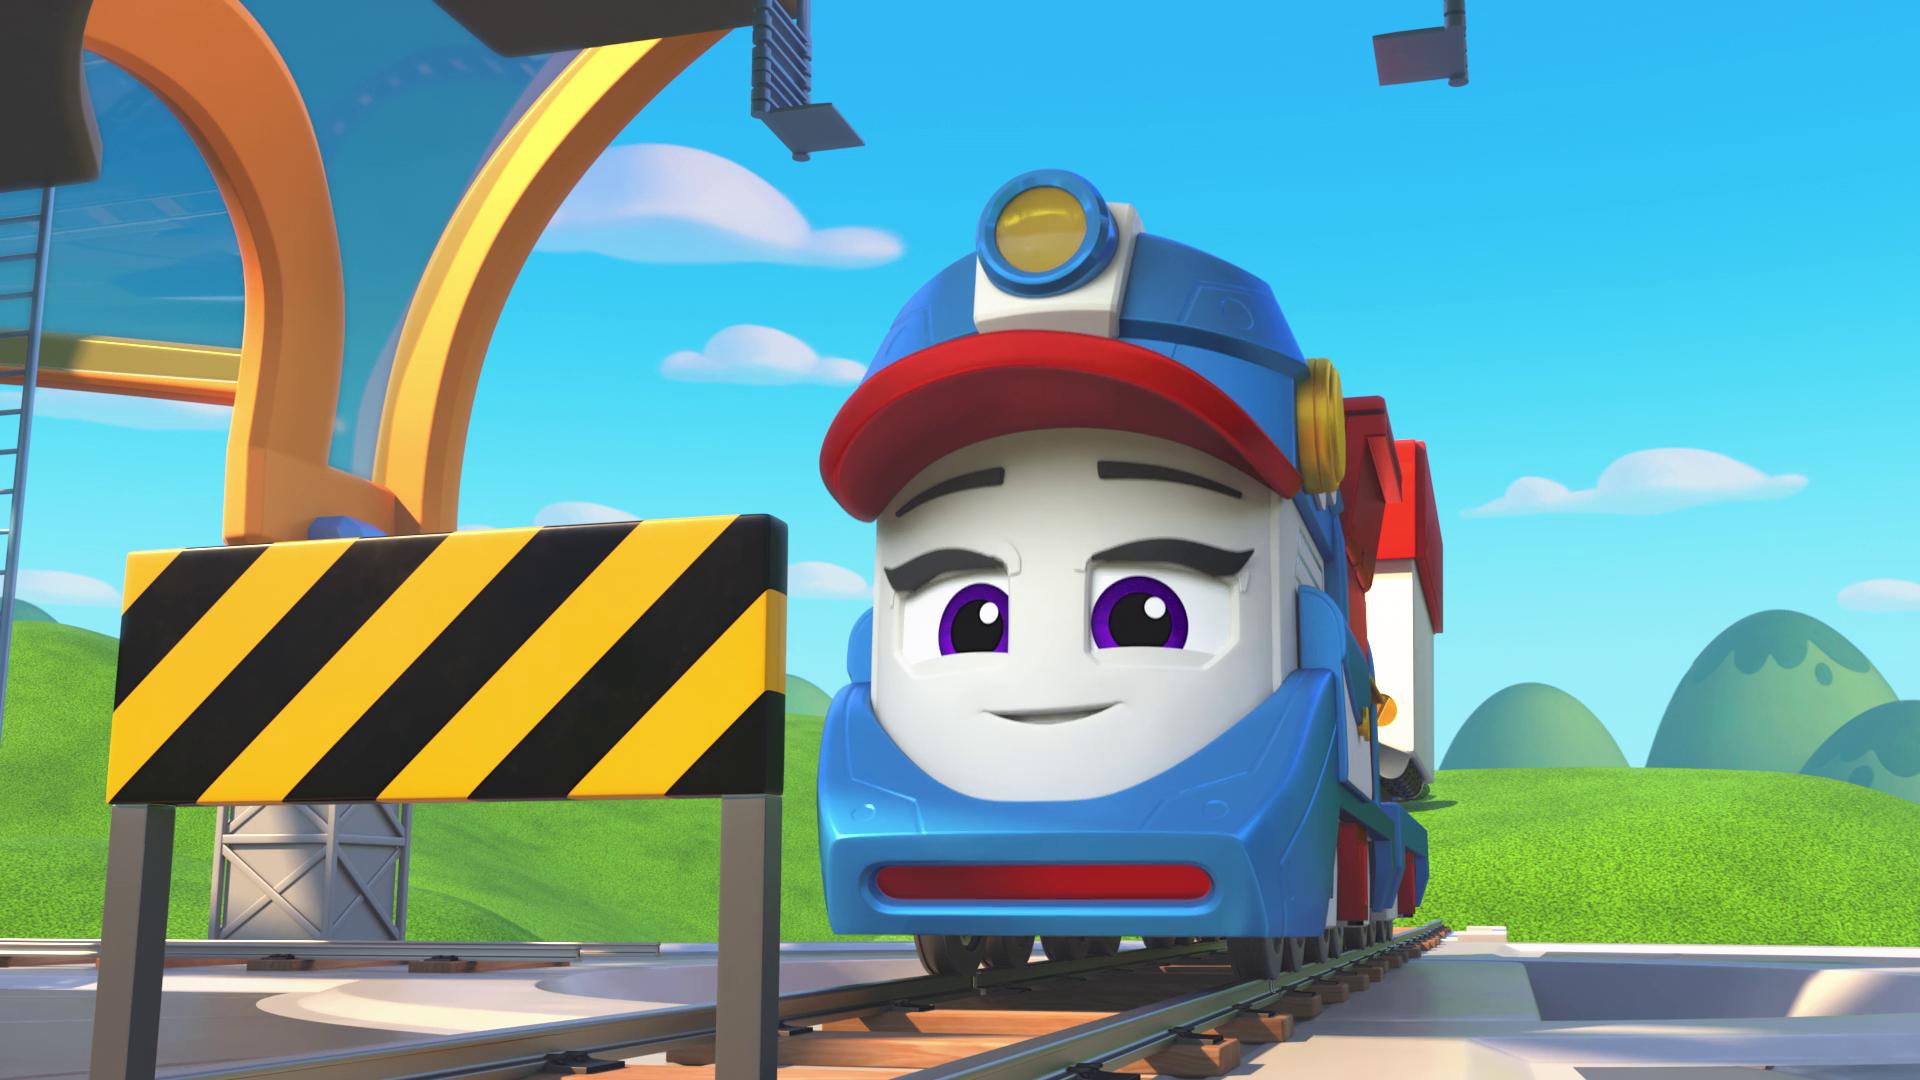 Mighty Express: Una aventura navideña (2020) 1080p WEB-DL Latino